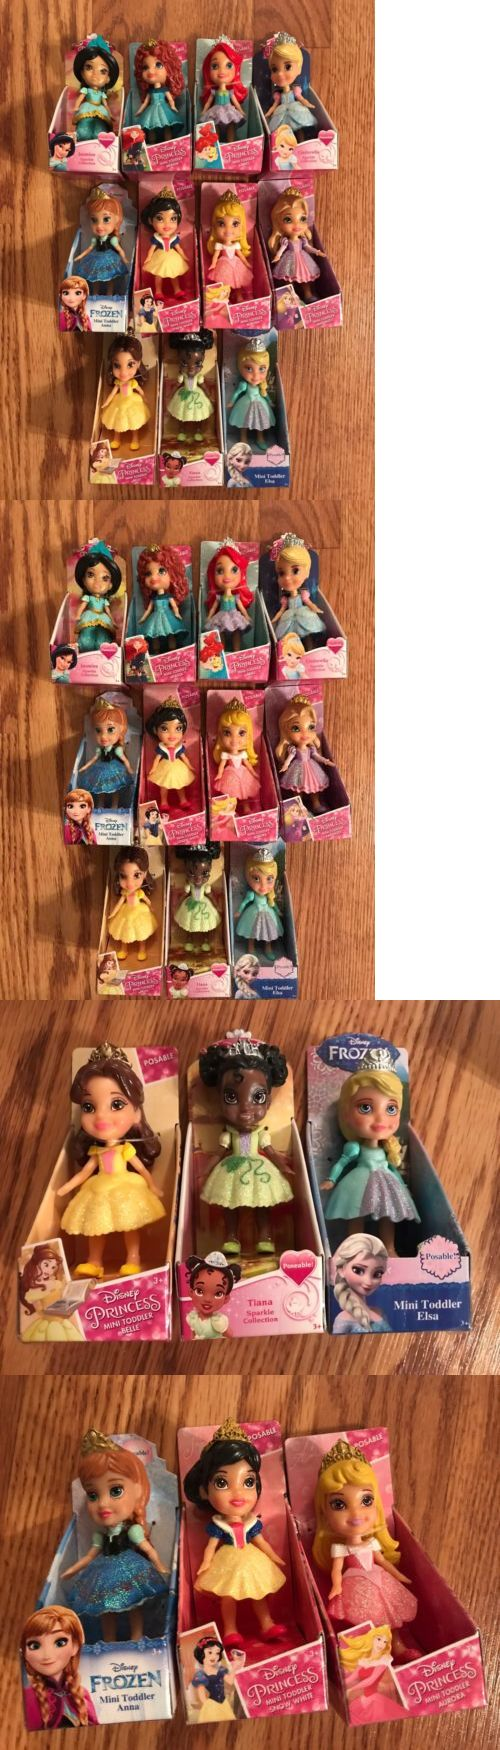 Disney Princesses 146030: Complete Set 11 Disney Princess Sparkle Mini Toddler Dolls Jasmine Merida Nib -> BUY IT NOW ONLY: $124.98 on eBay!